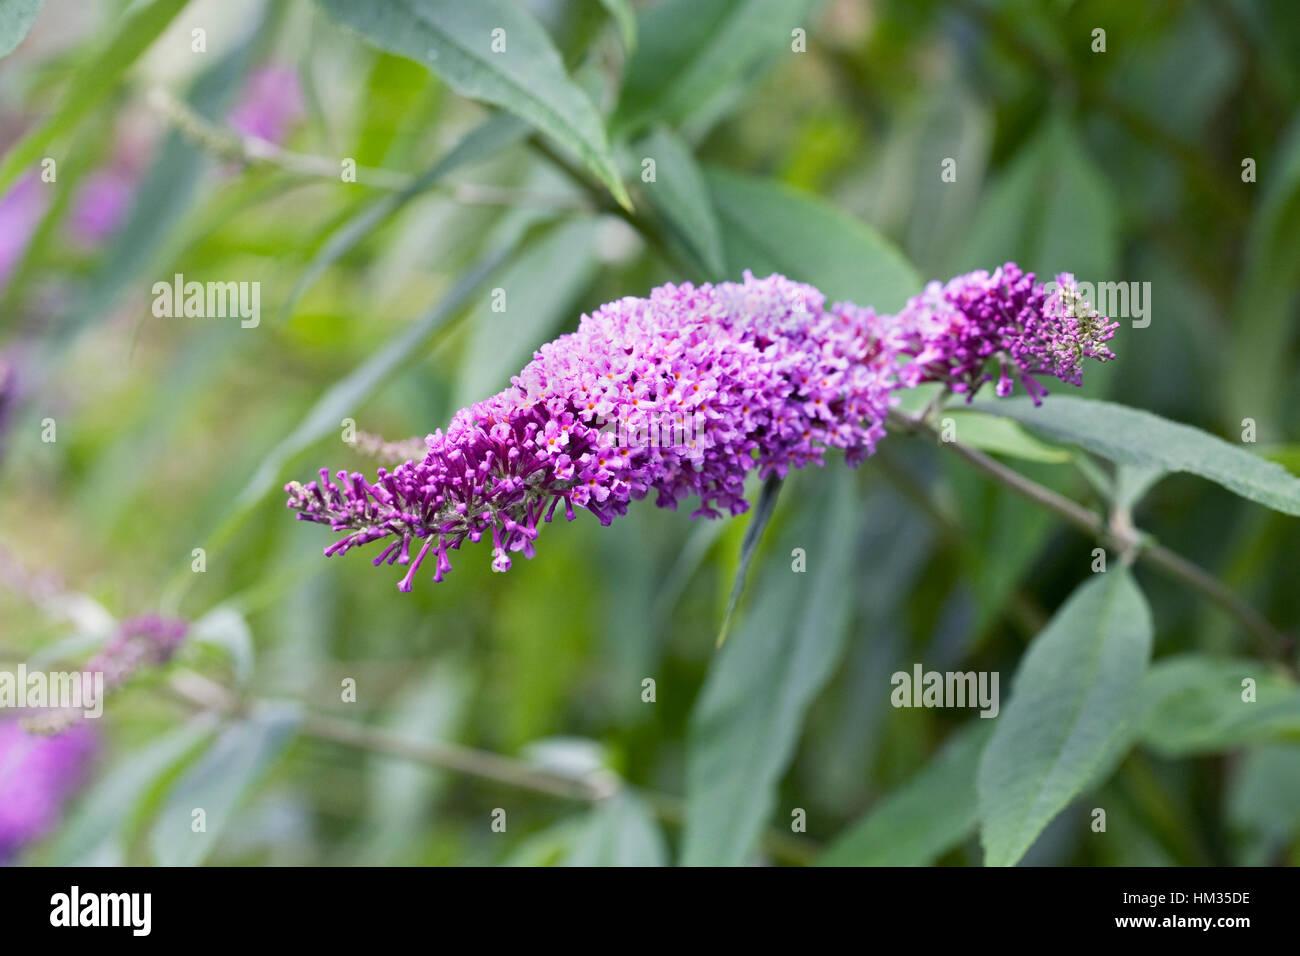 Buddleja davidii Buzz flowers. - Stock Image